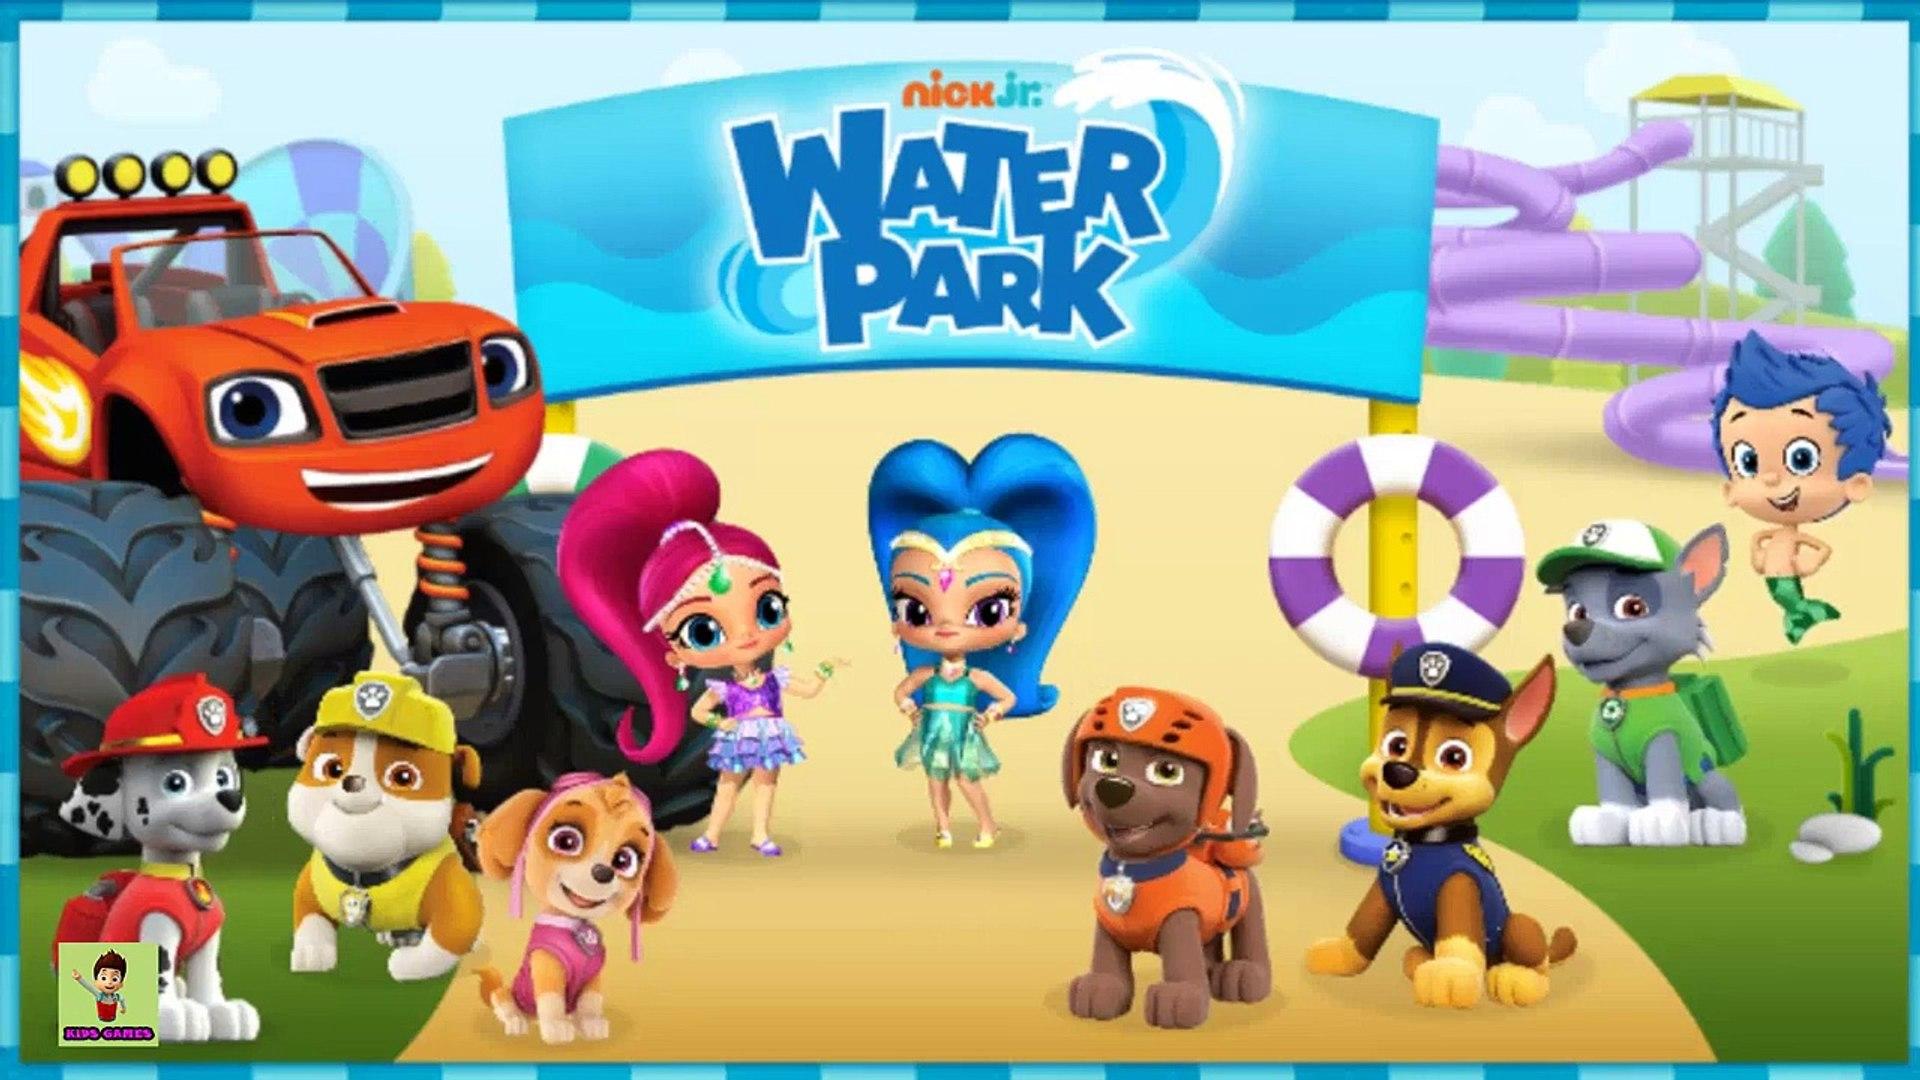 Fun Kids Videos - Education Video for Kids Games Play Free Water Park Fun